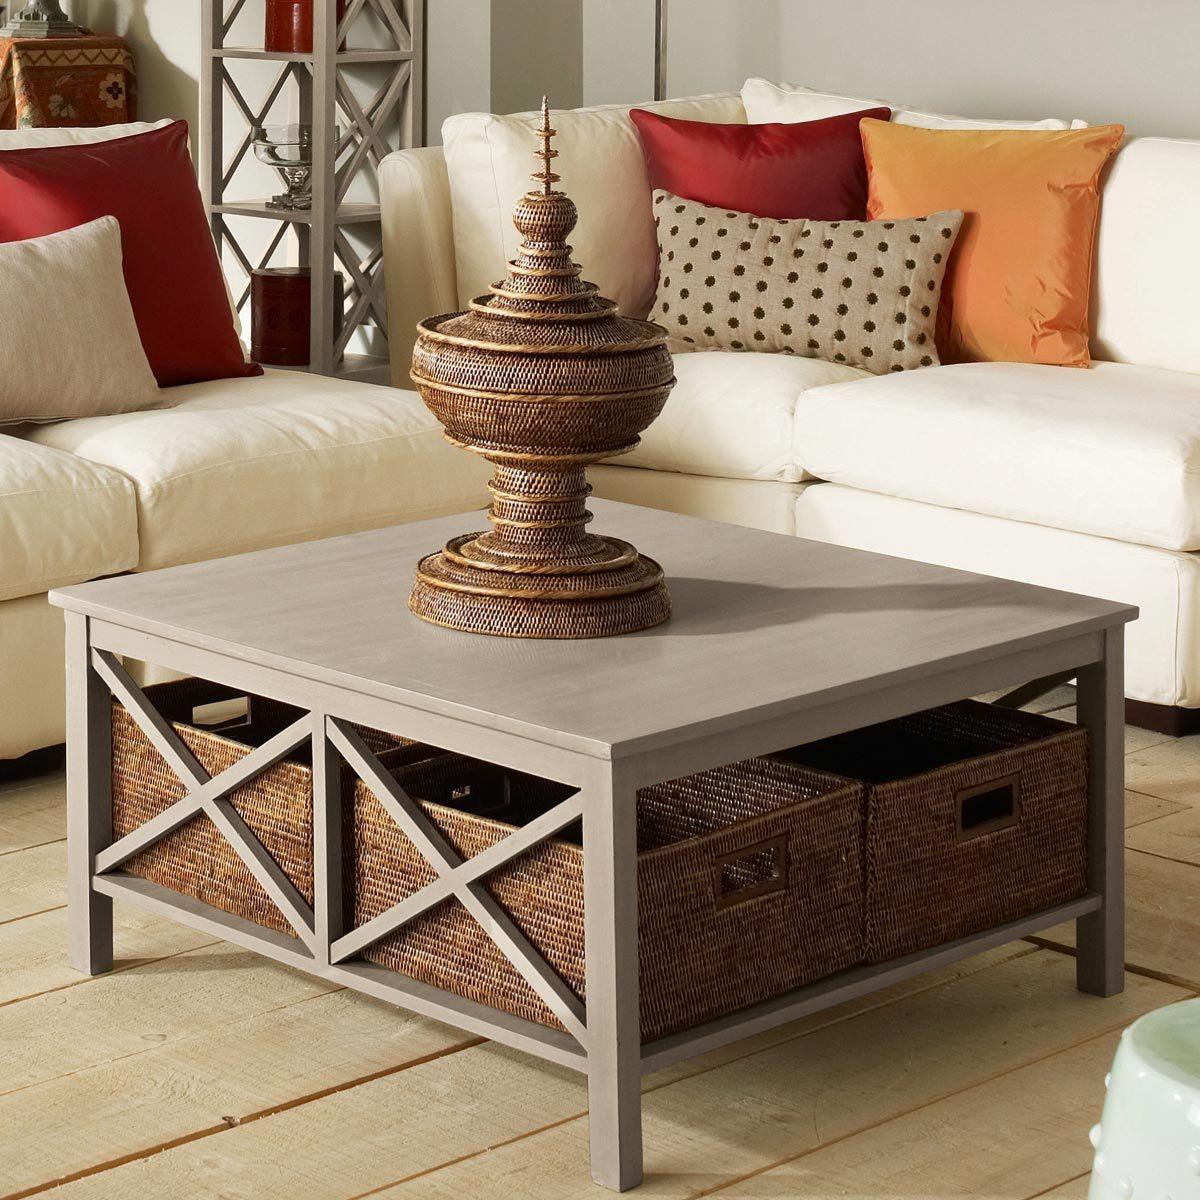 Park Art My WordPress Blog_Wood Block Coffee Table With Storage